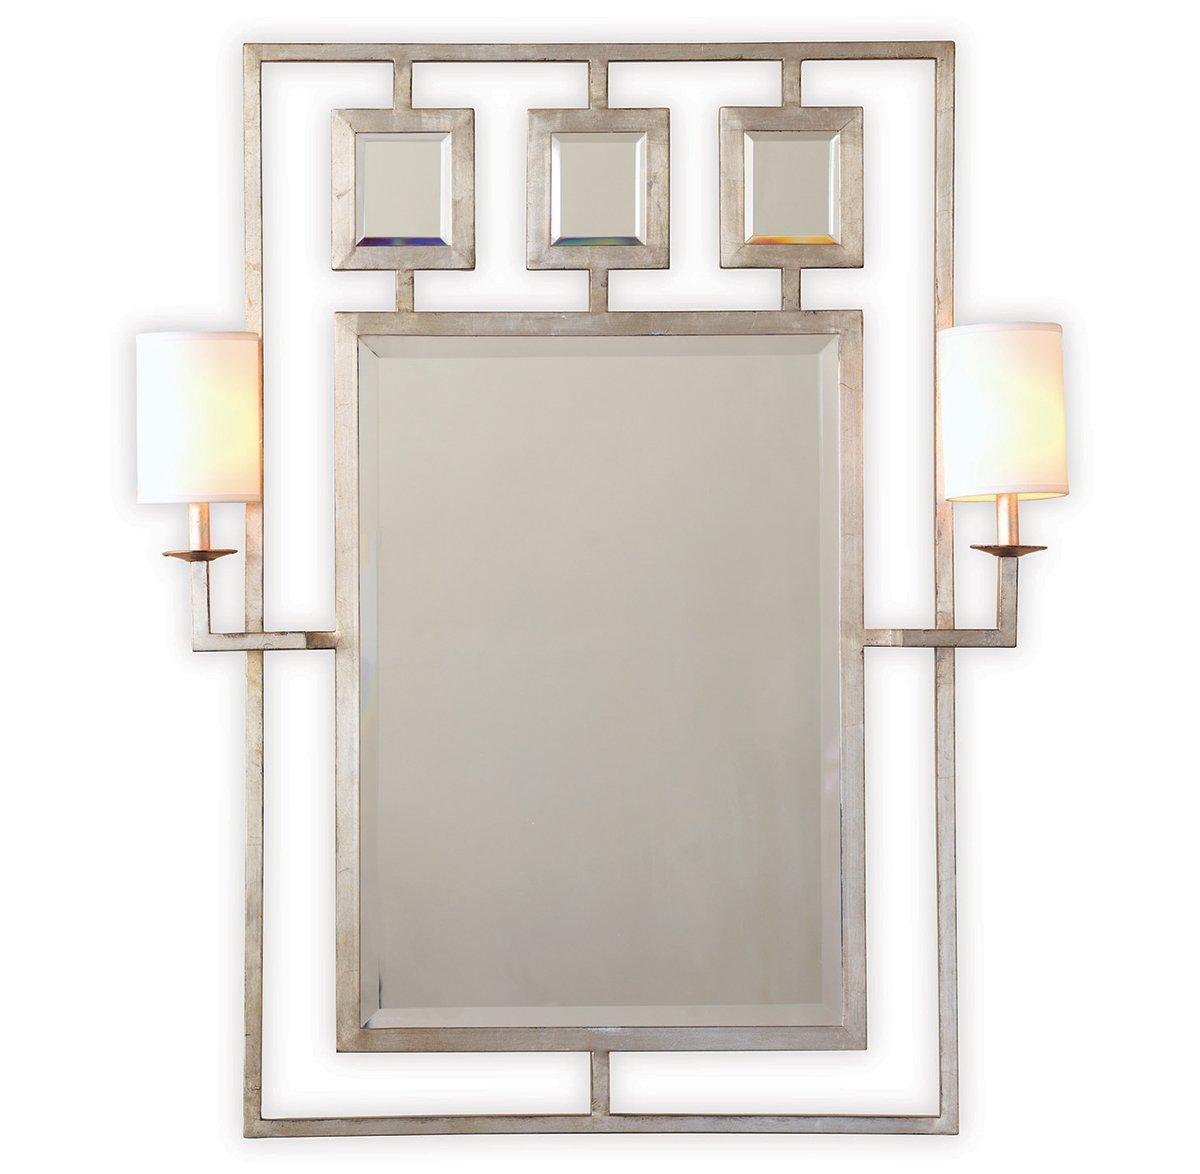 Park Avenue Hollywood Regency Silver Leaf Mirror With Sconces